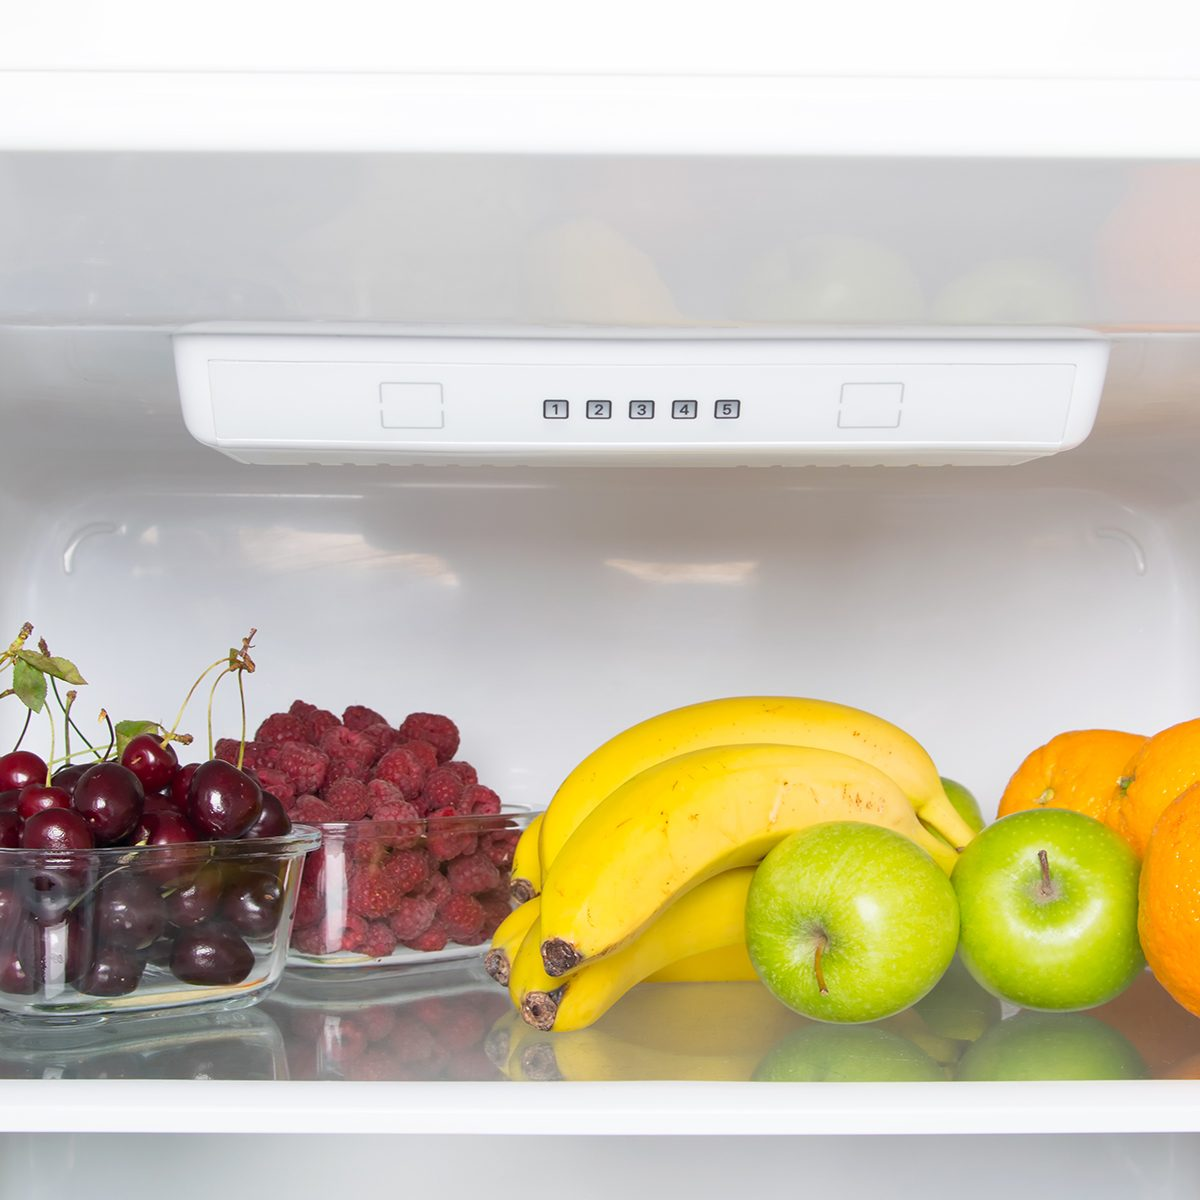 White refrigerator shelf close-up, fruits and berries, raspberries and cherries